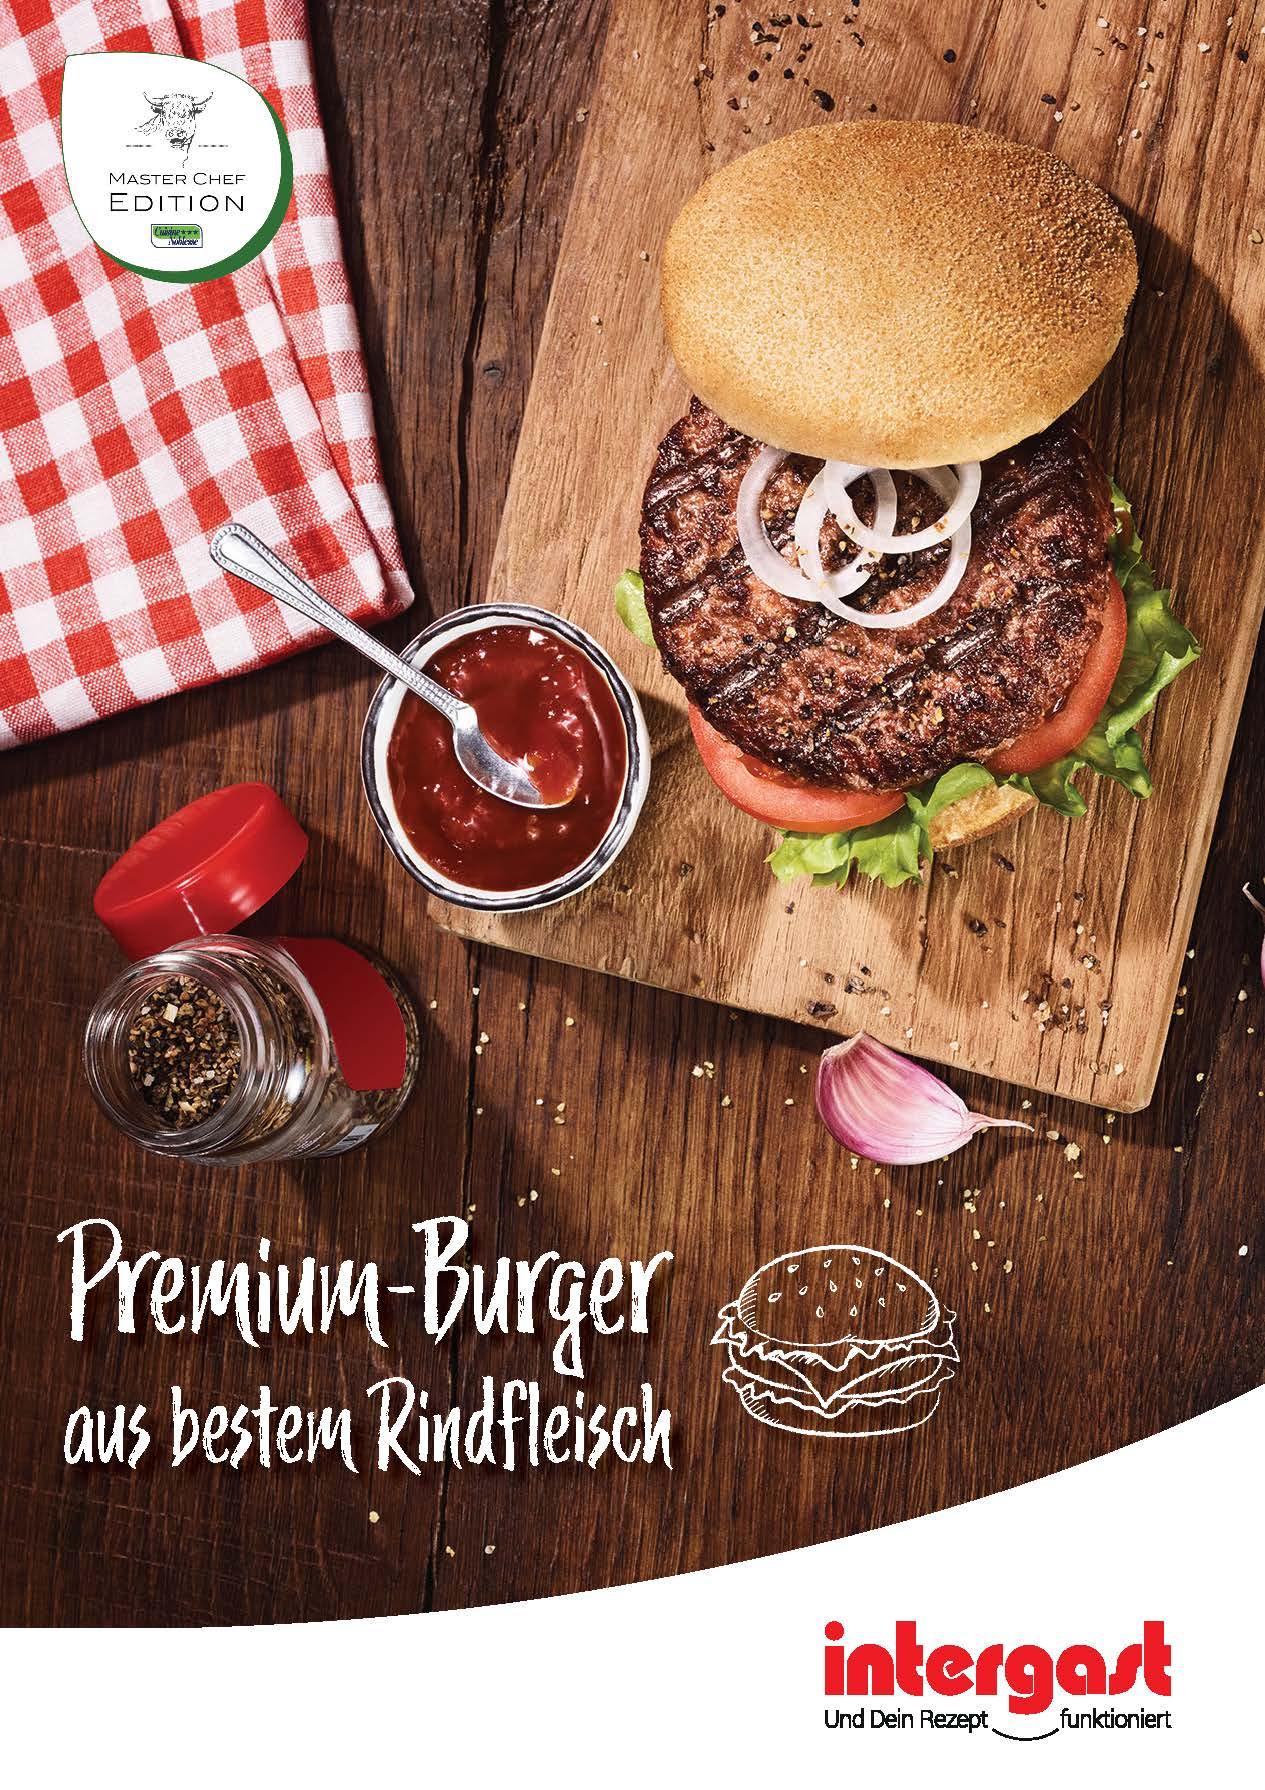 Master Chef Edition Burger